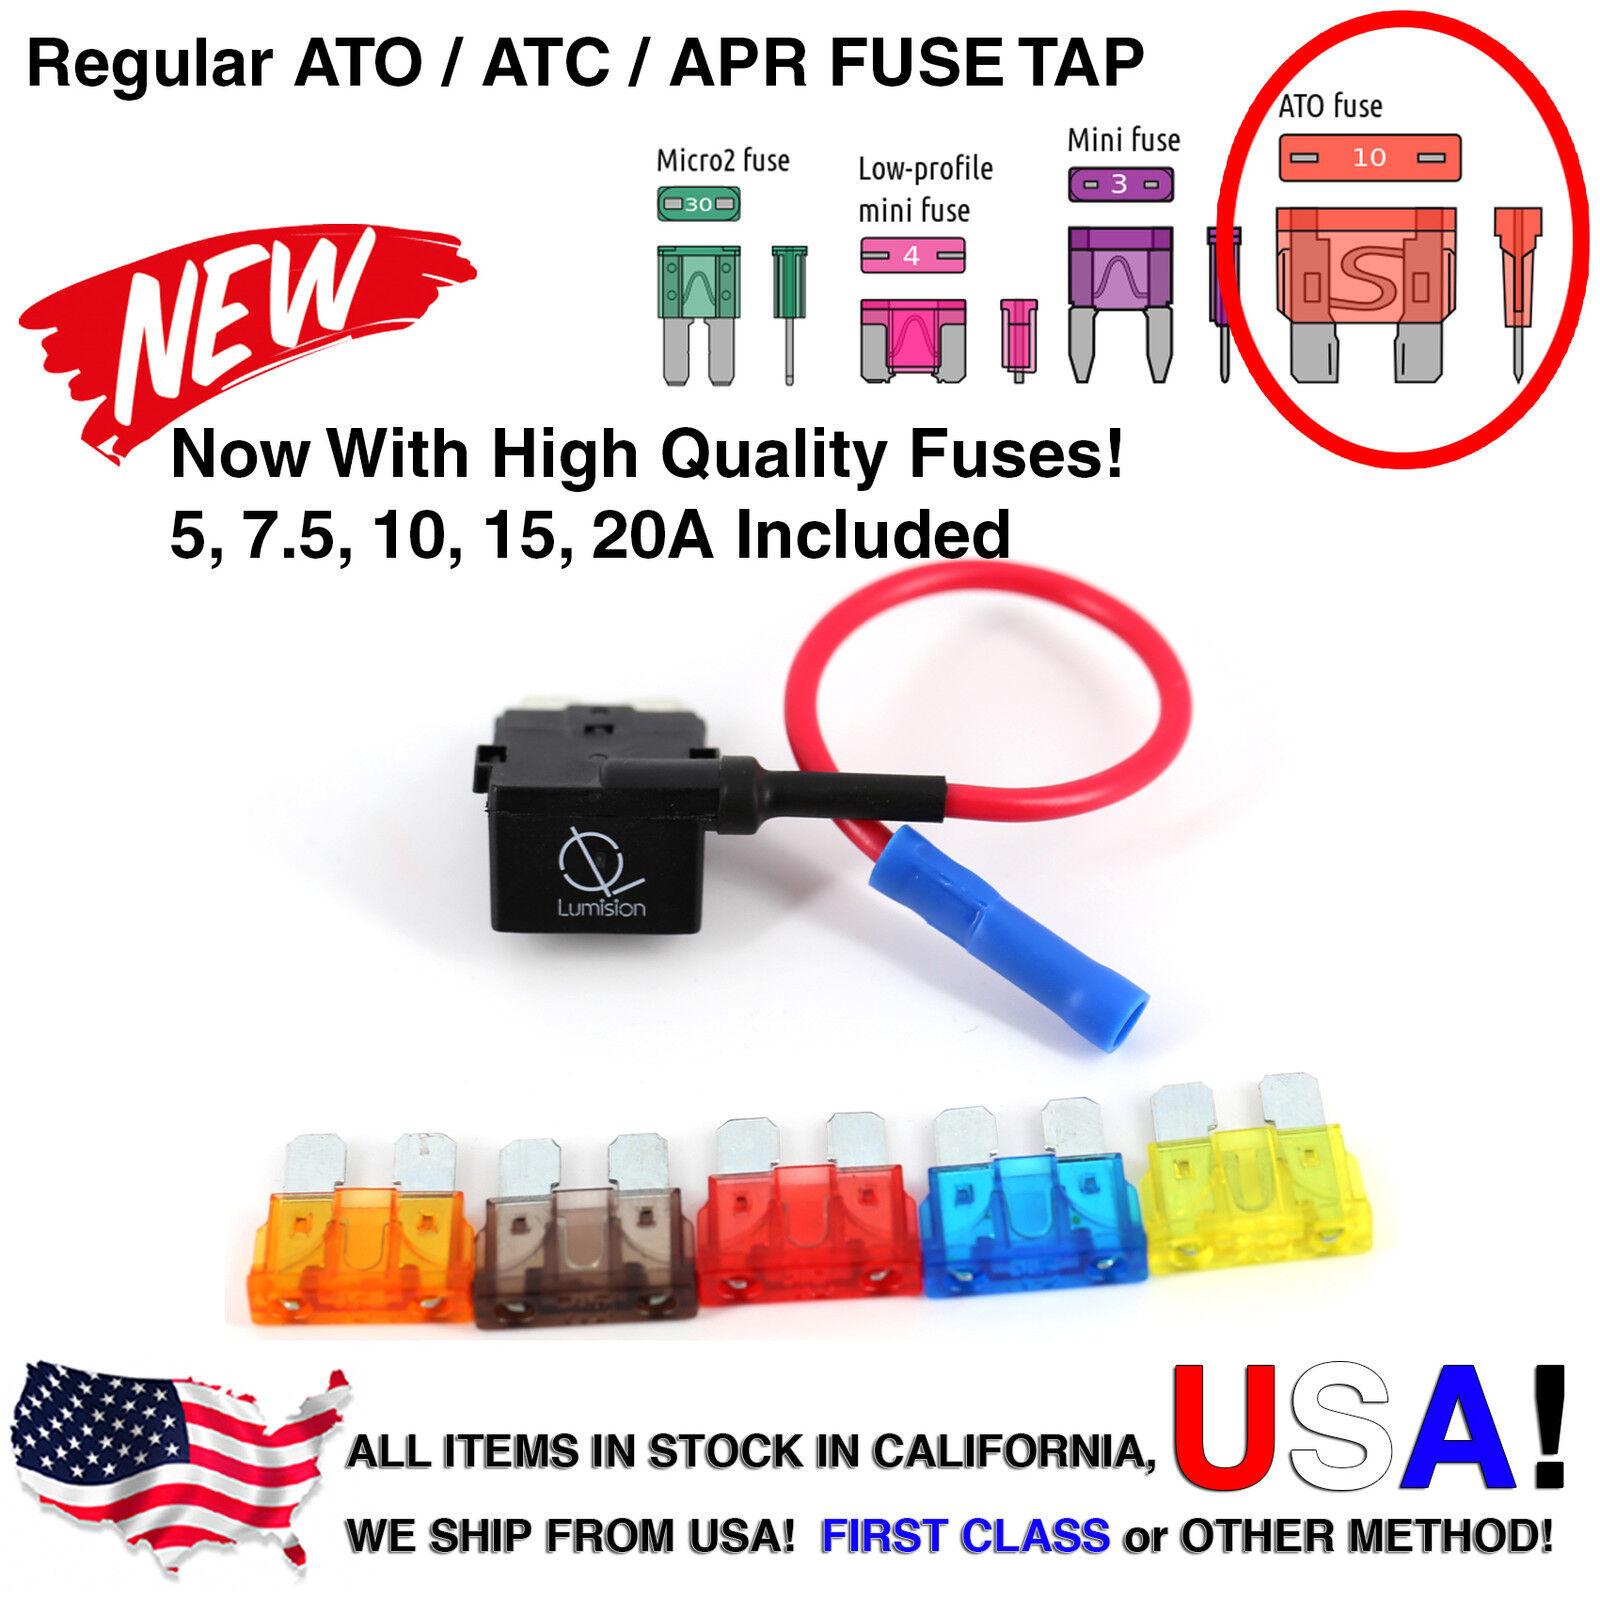 50 Pack Regular ATO ATC APR Add-A-Circuit Lumision Fuse Tap Lot Dash Cam Radar